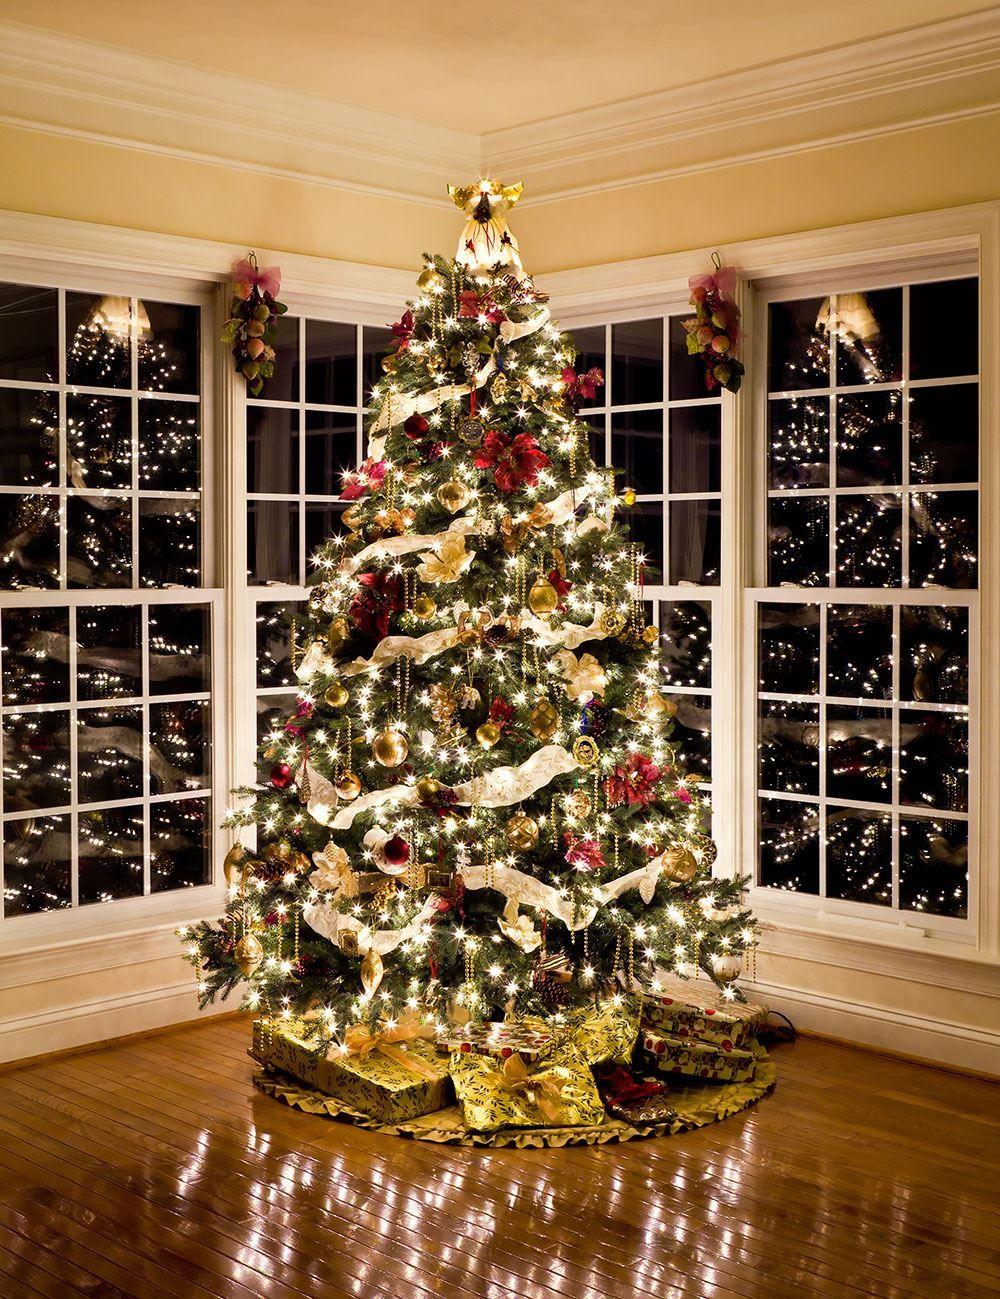 Christmas Mini Light Sets 100 Light White Wire 4 Spacing Christmas Lights Christmas Tree With Presents Cool Christmas Trees